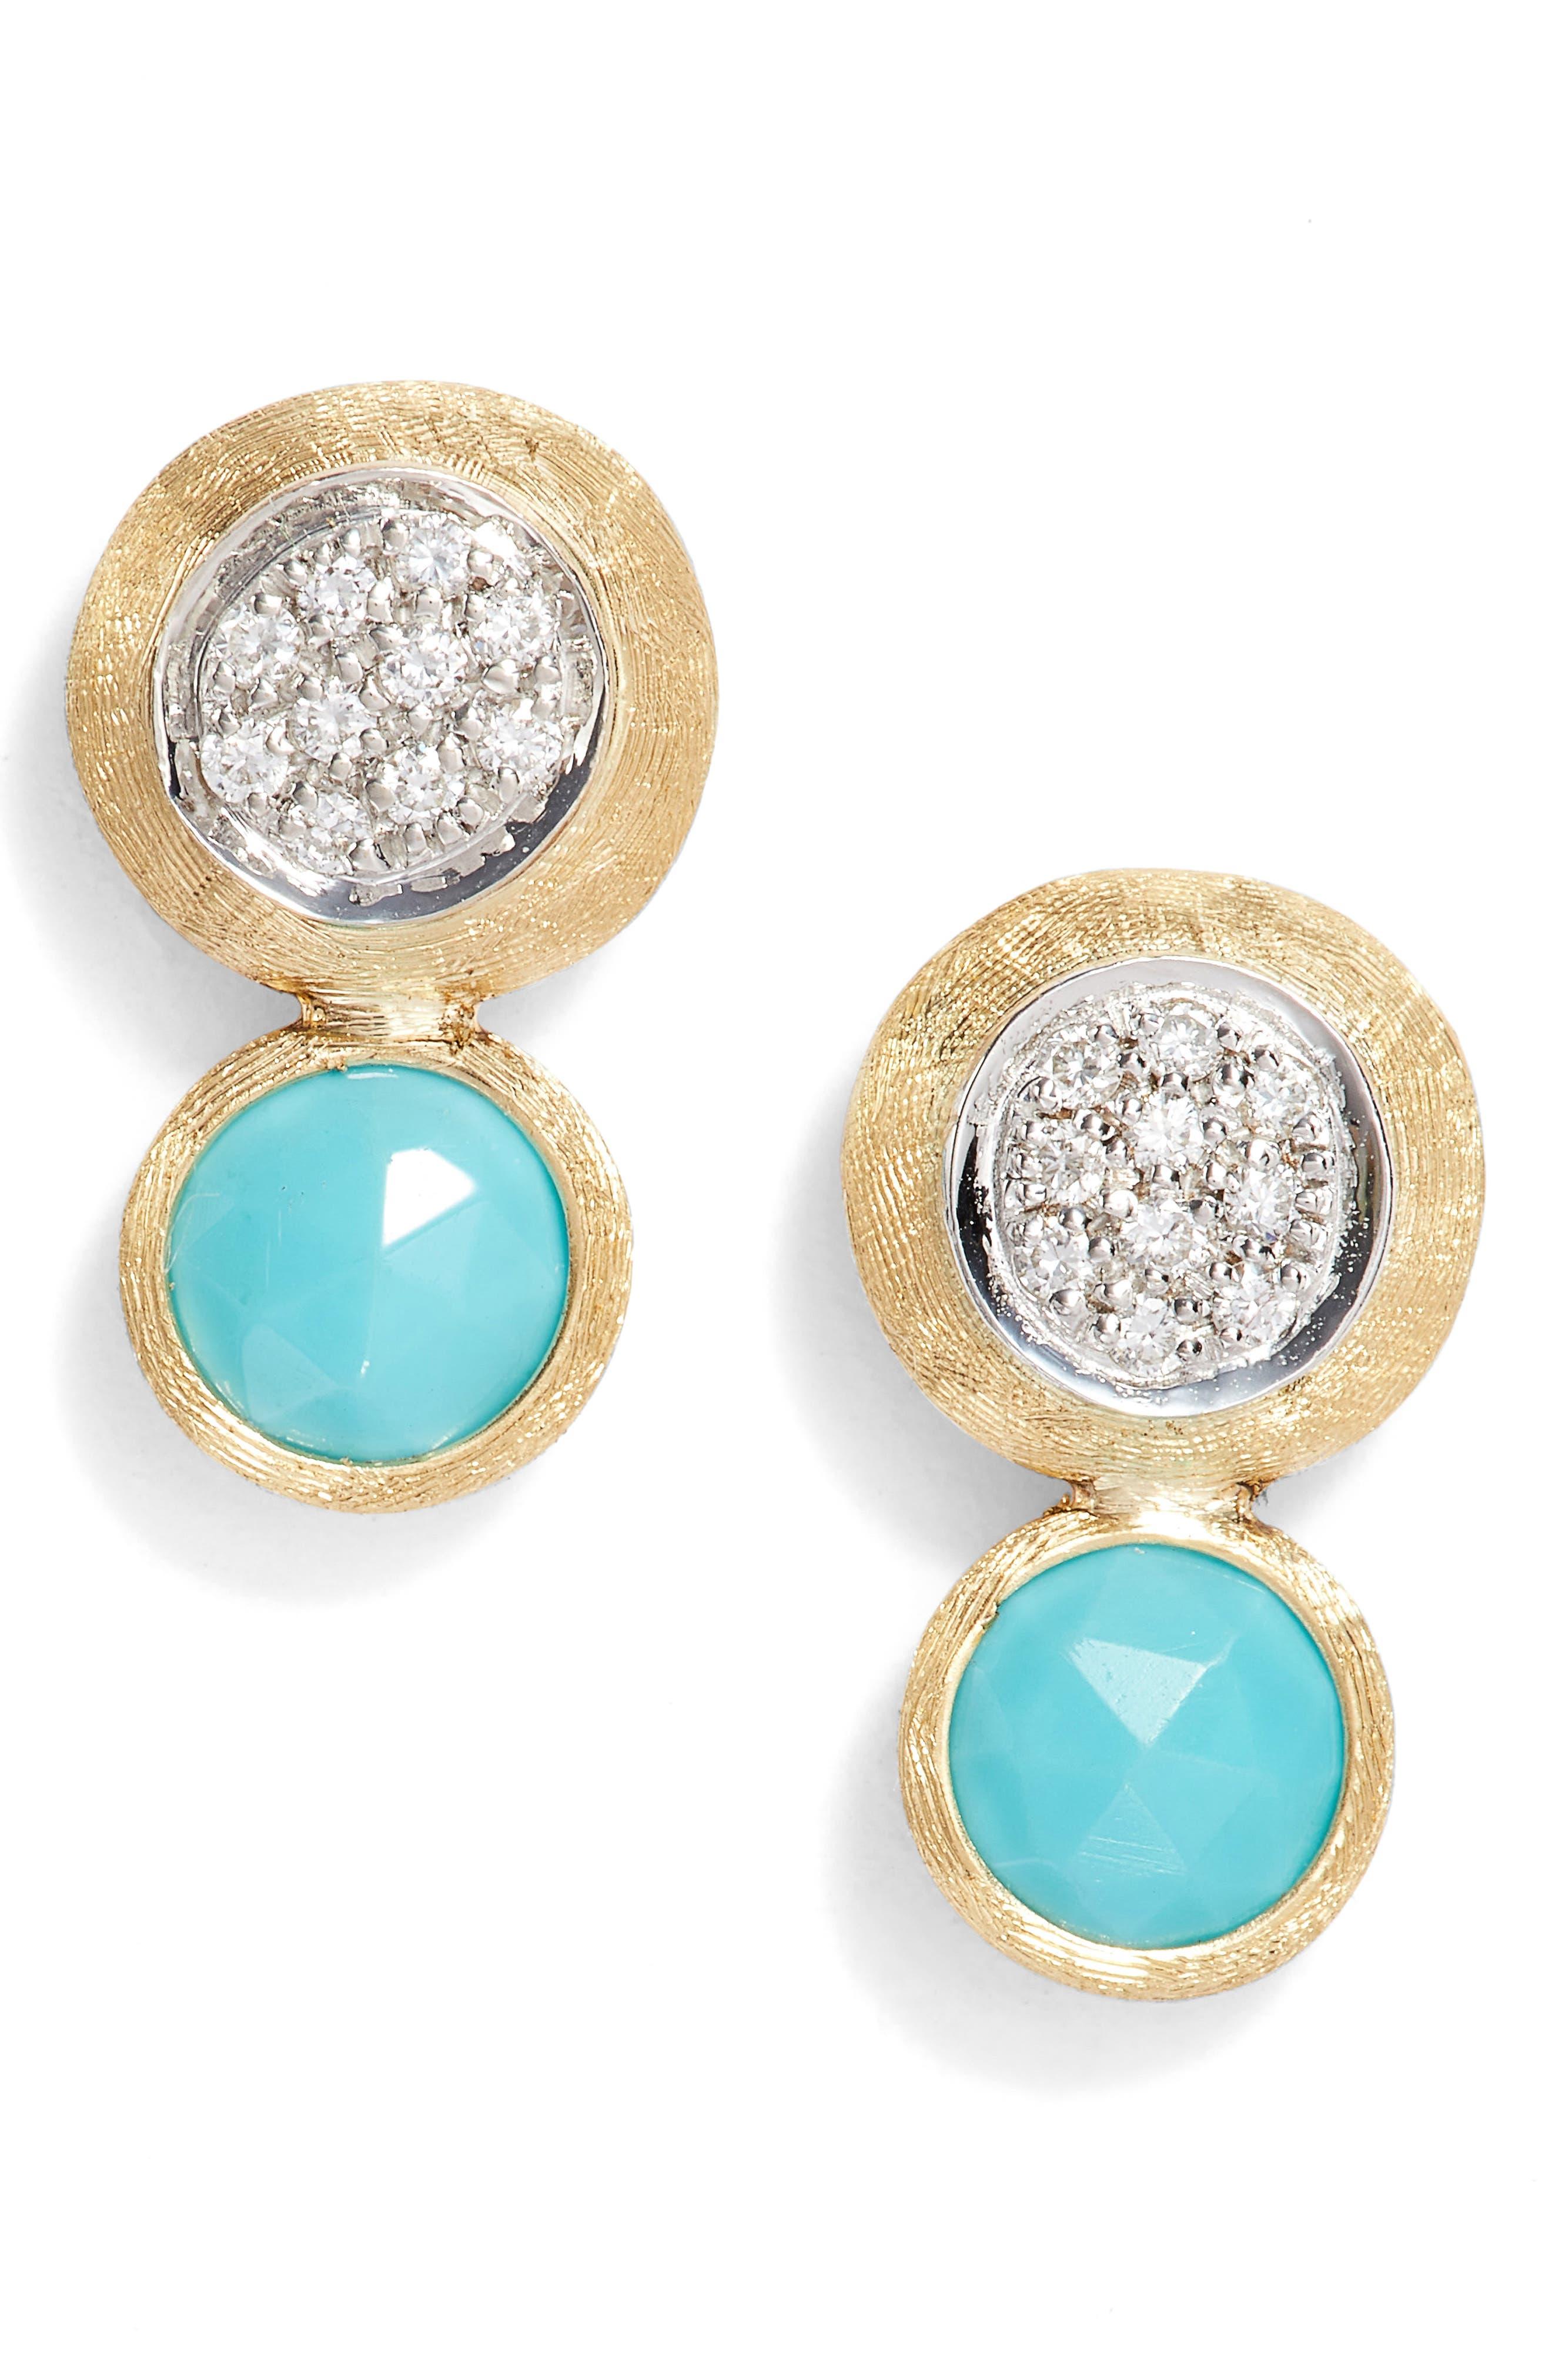 Jaipur Diamond & Turquoise Stud Earrings,                             Main thumbnail 1, color,                             710